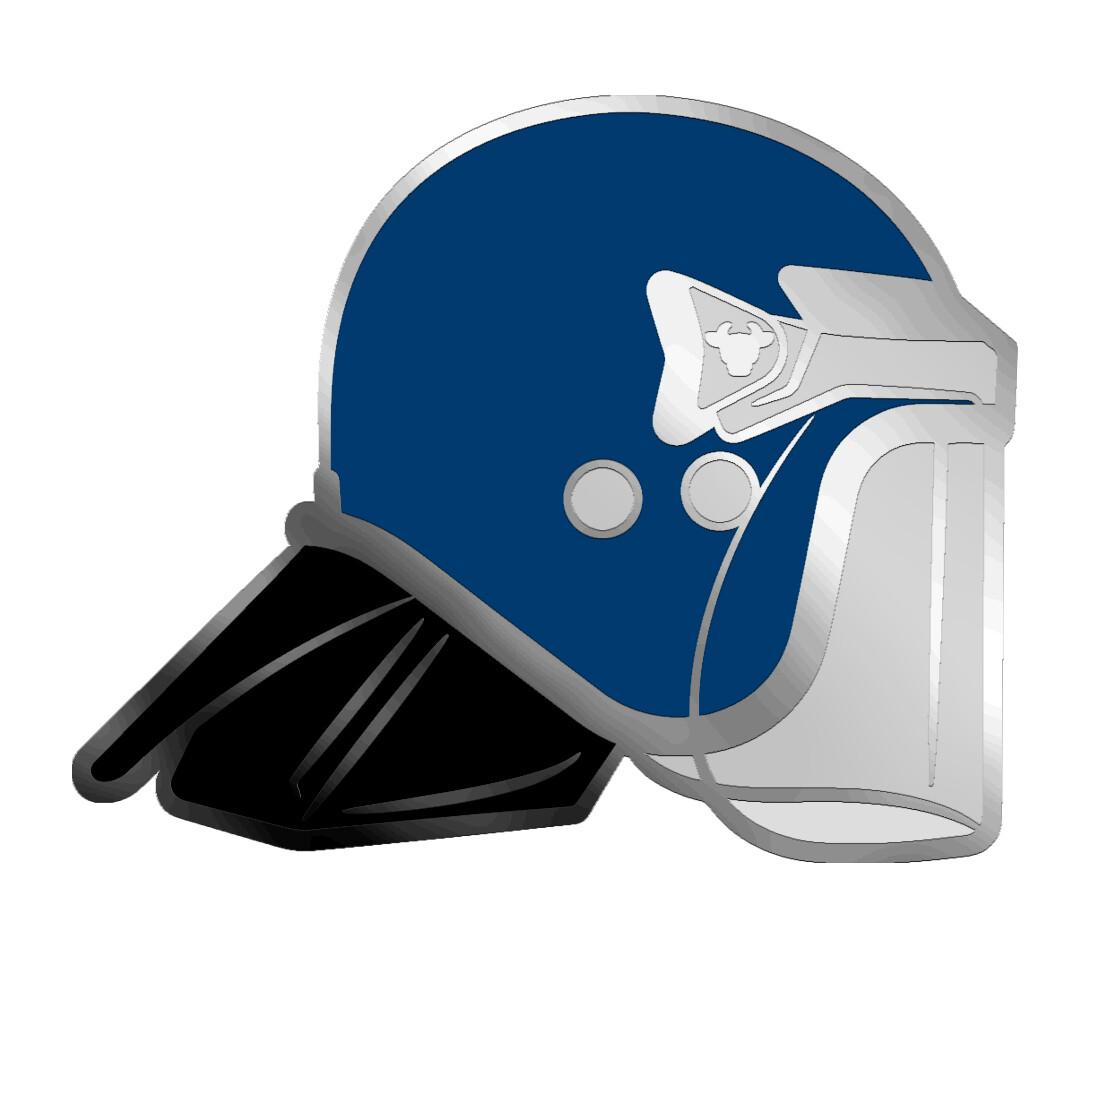 Blue BullHat Pin Badge